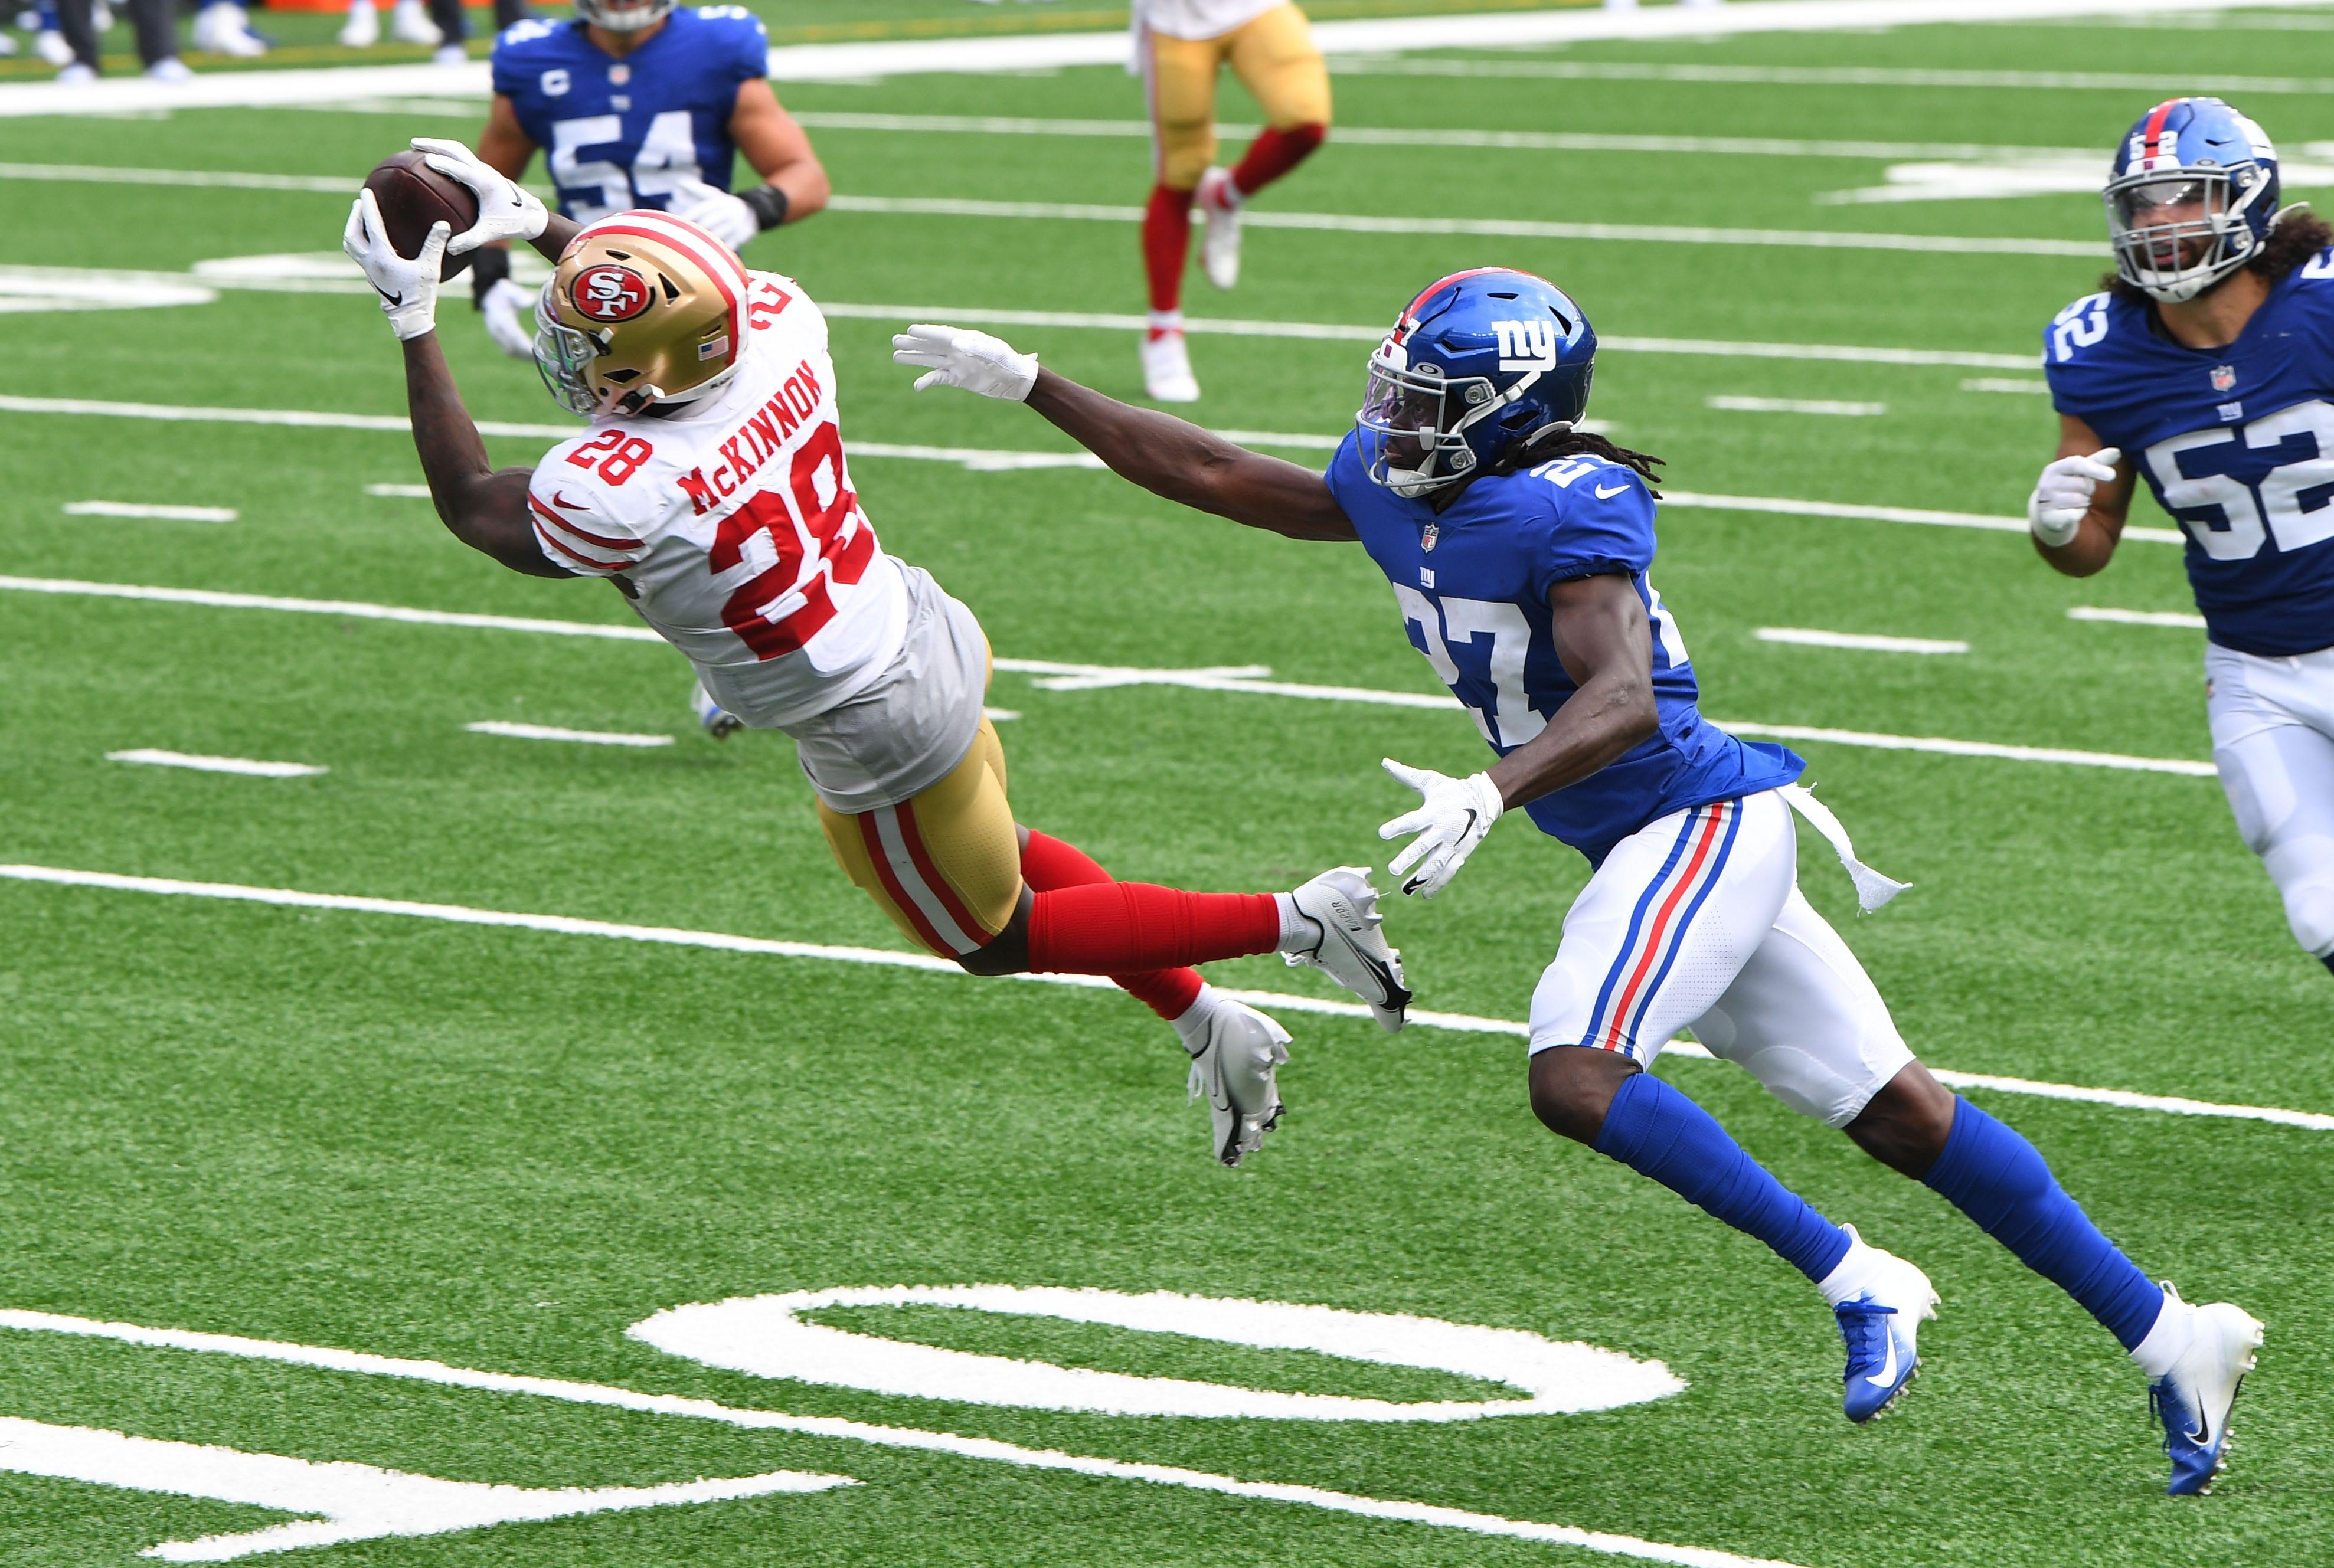 NFL Week 3's best photos